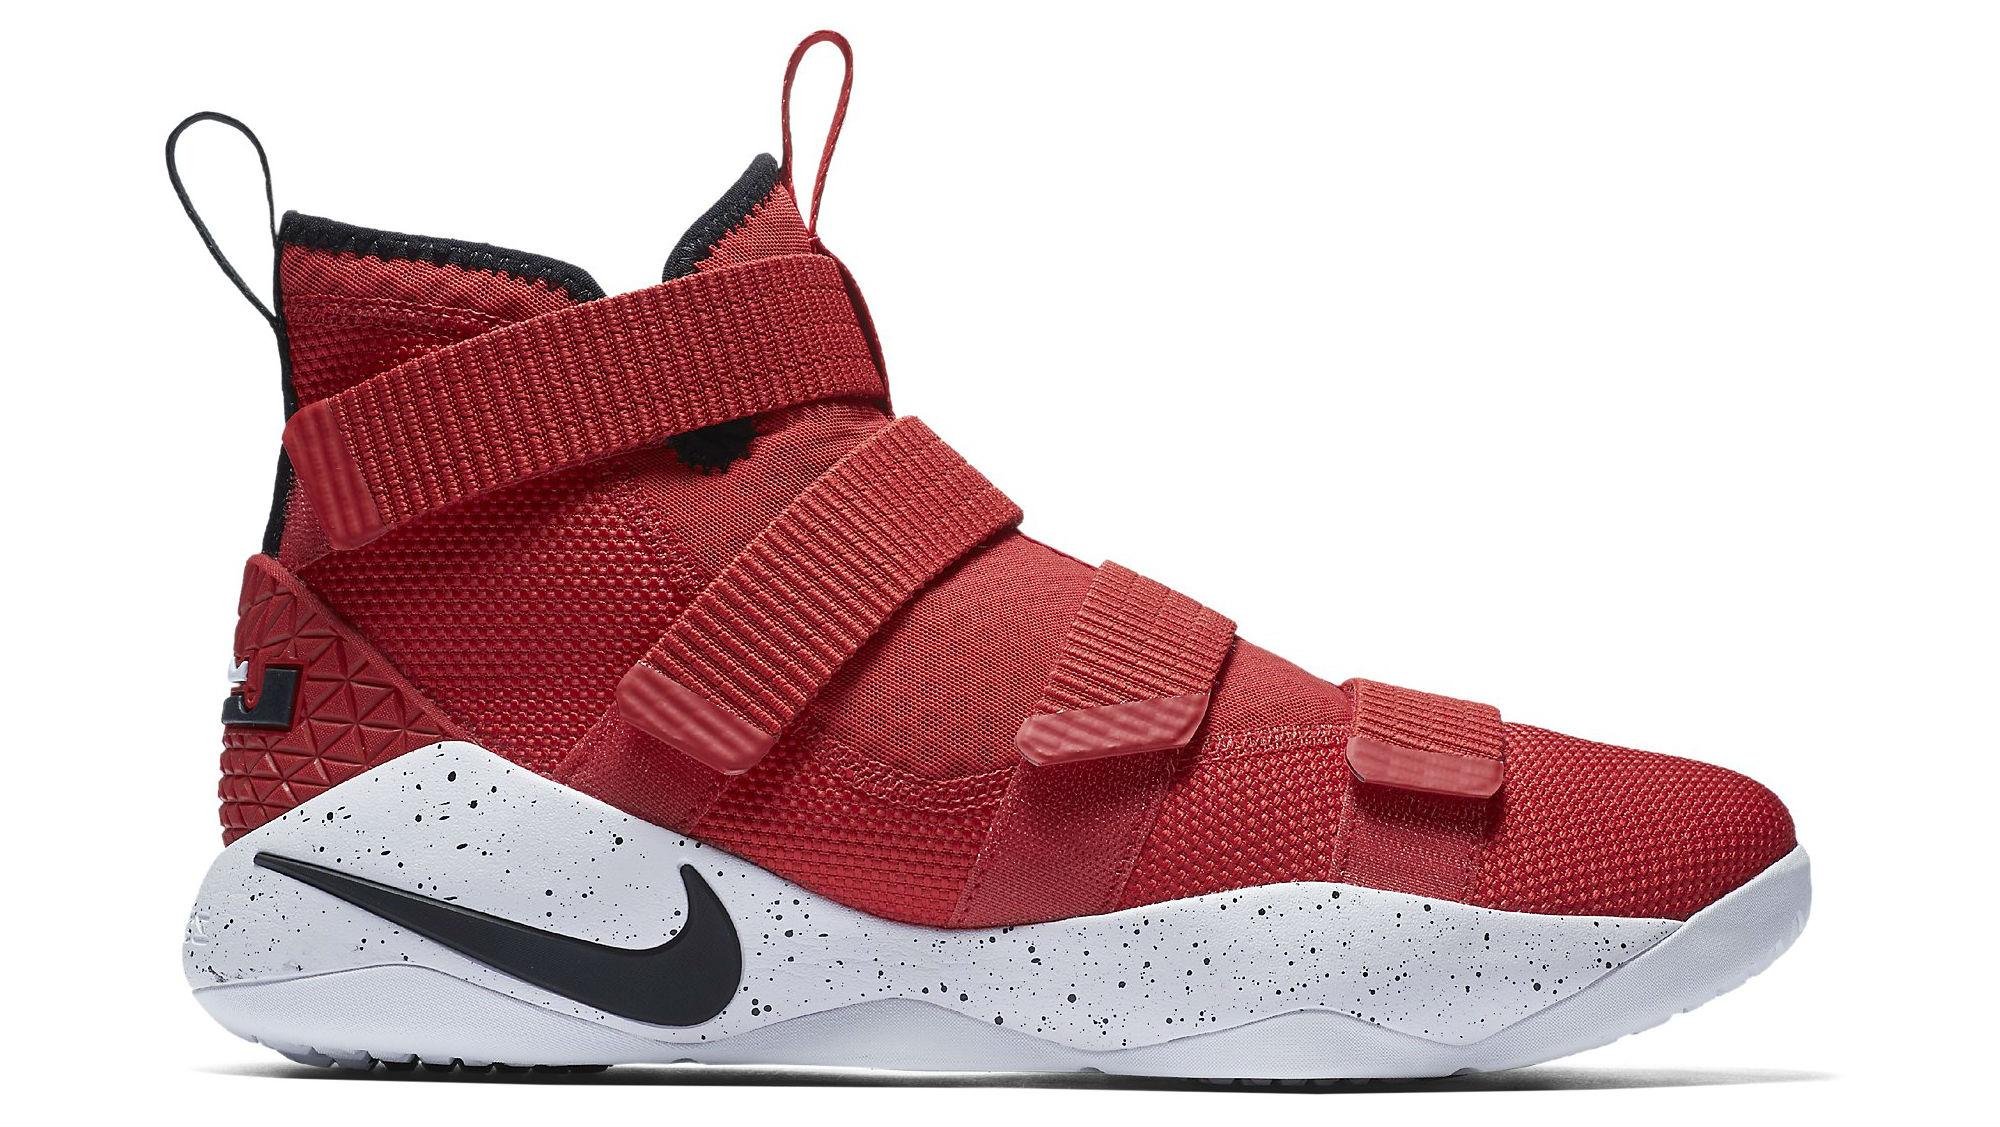 Nike LeBron Soldier 11 University Red/Black-White-Total Crimson